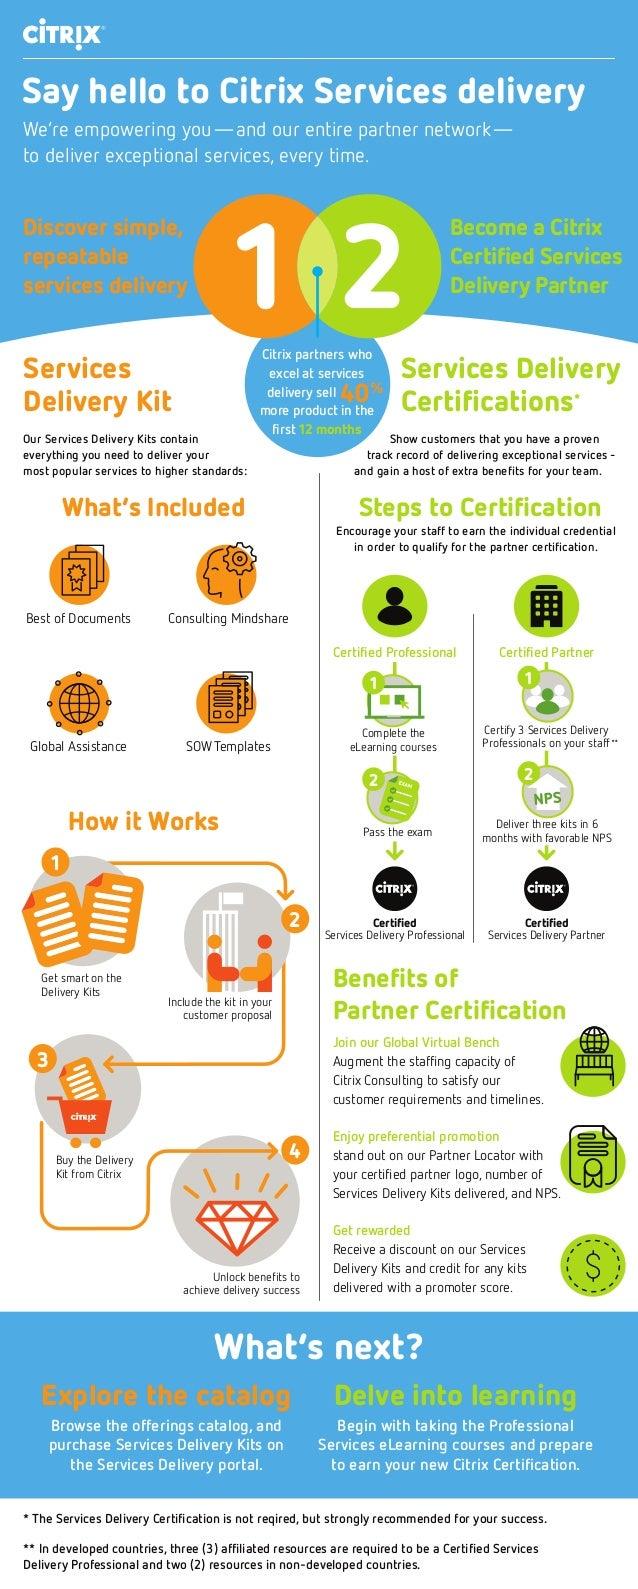 Introducing Citrix Services Delivery Program